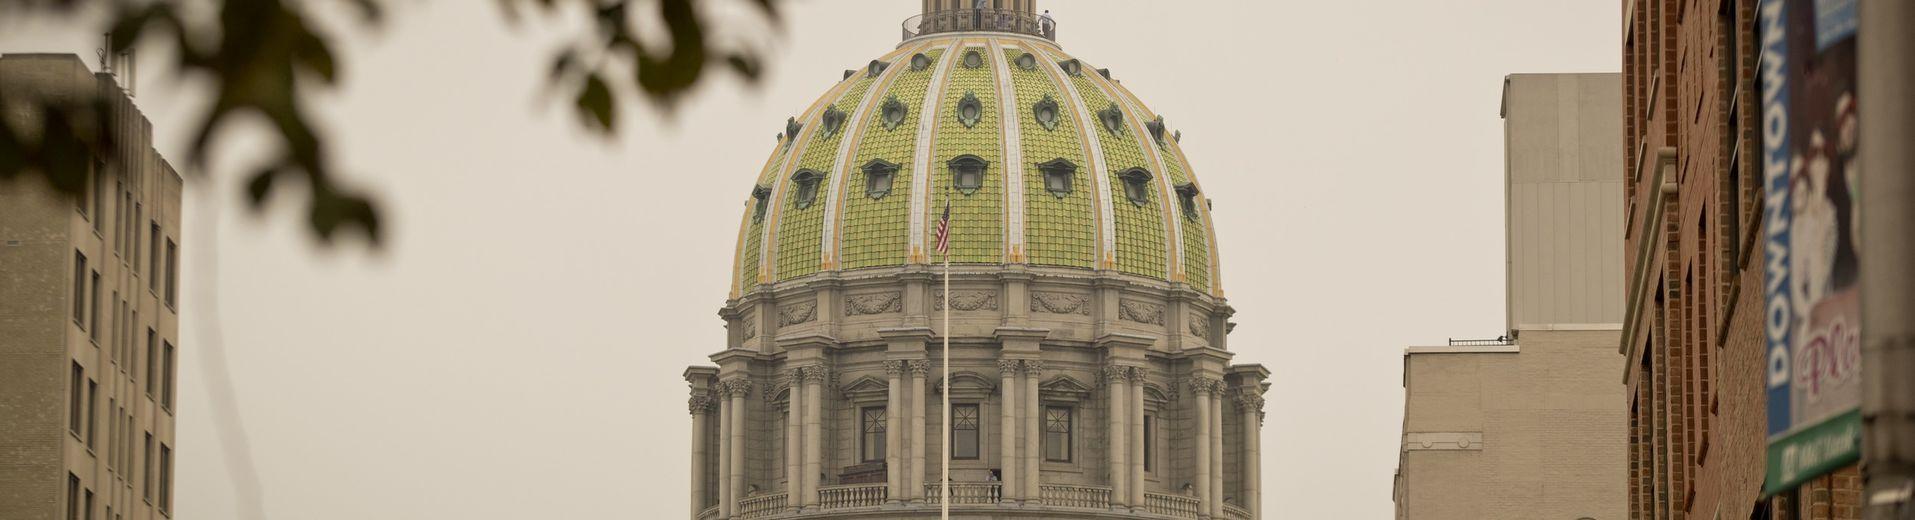 The Pennsylvania capitol building dome in Harrisburg.